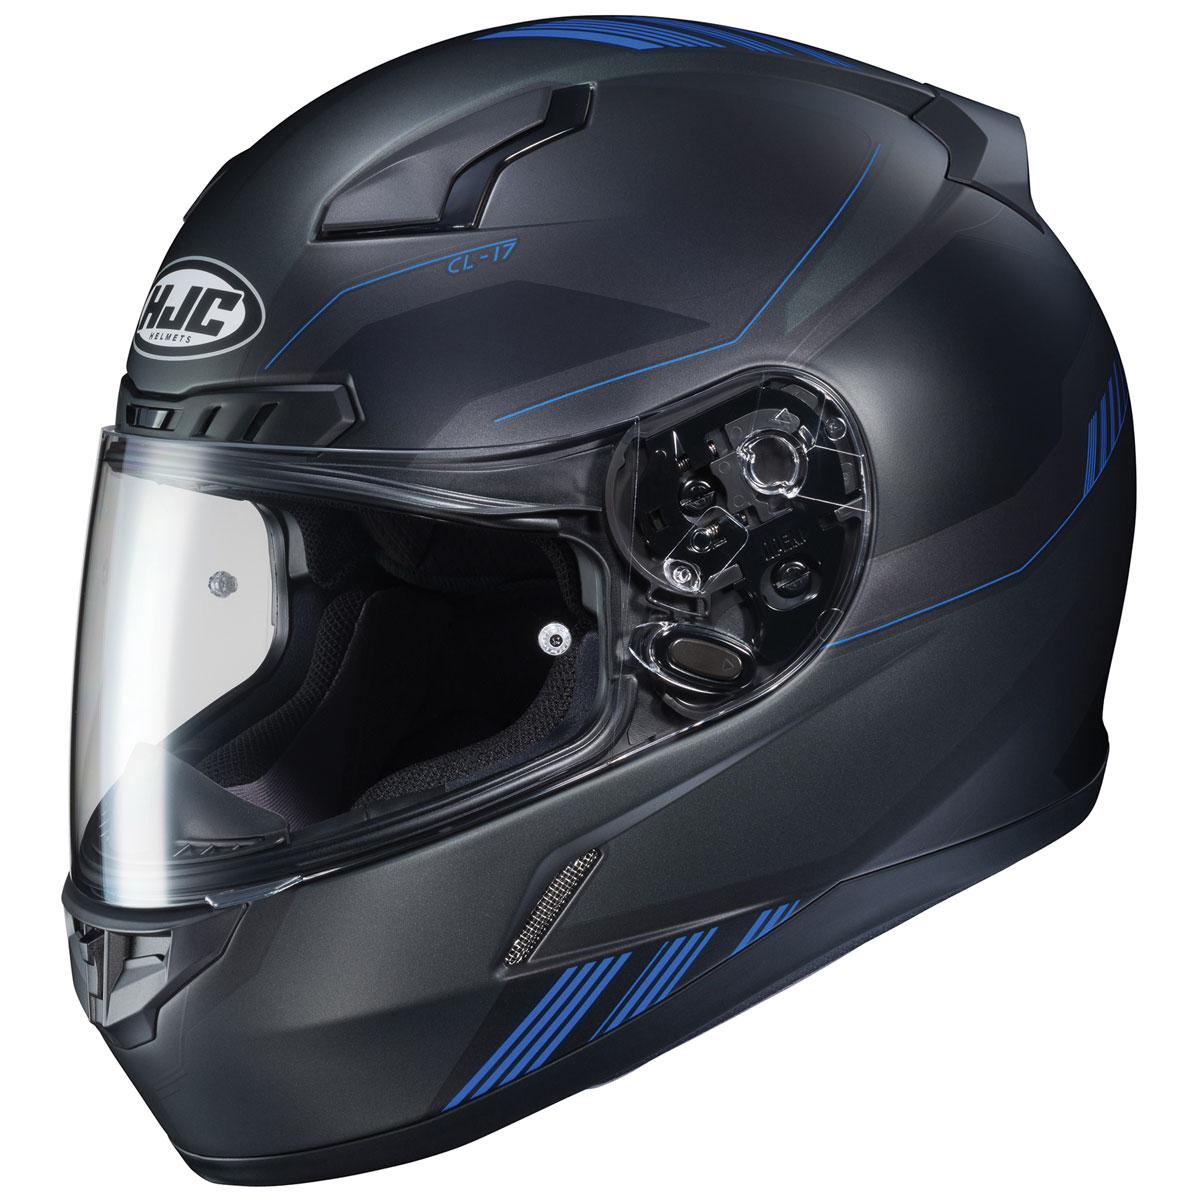 HJC CL-17 Combat Black/Blue Full Face Helmet